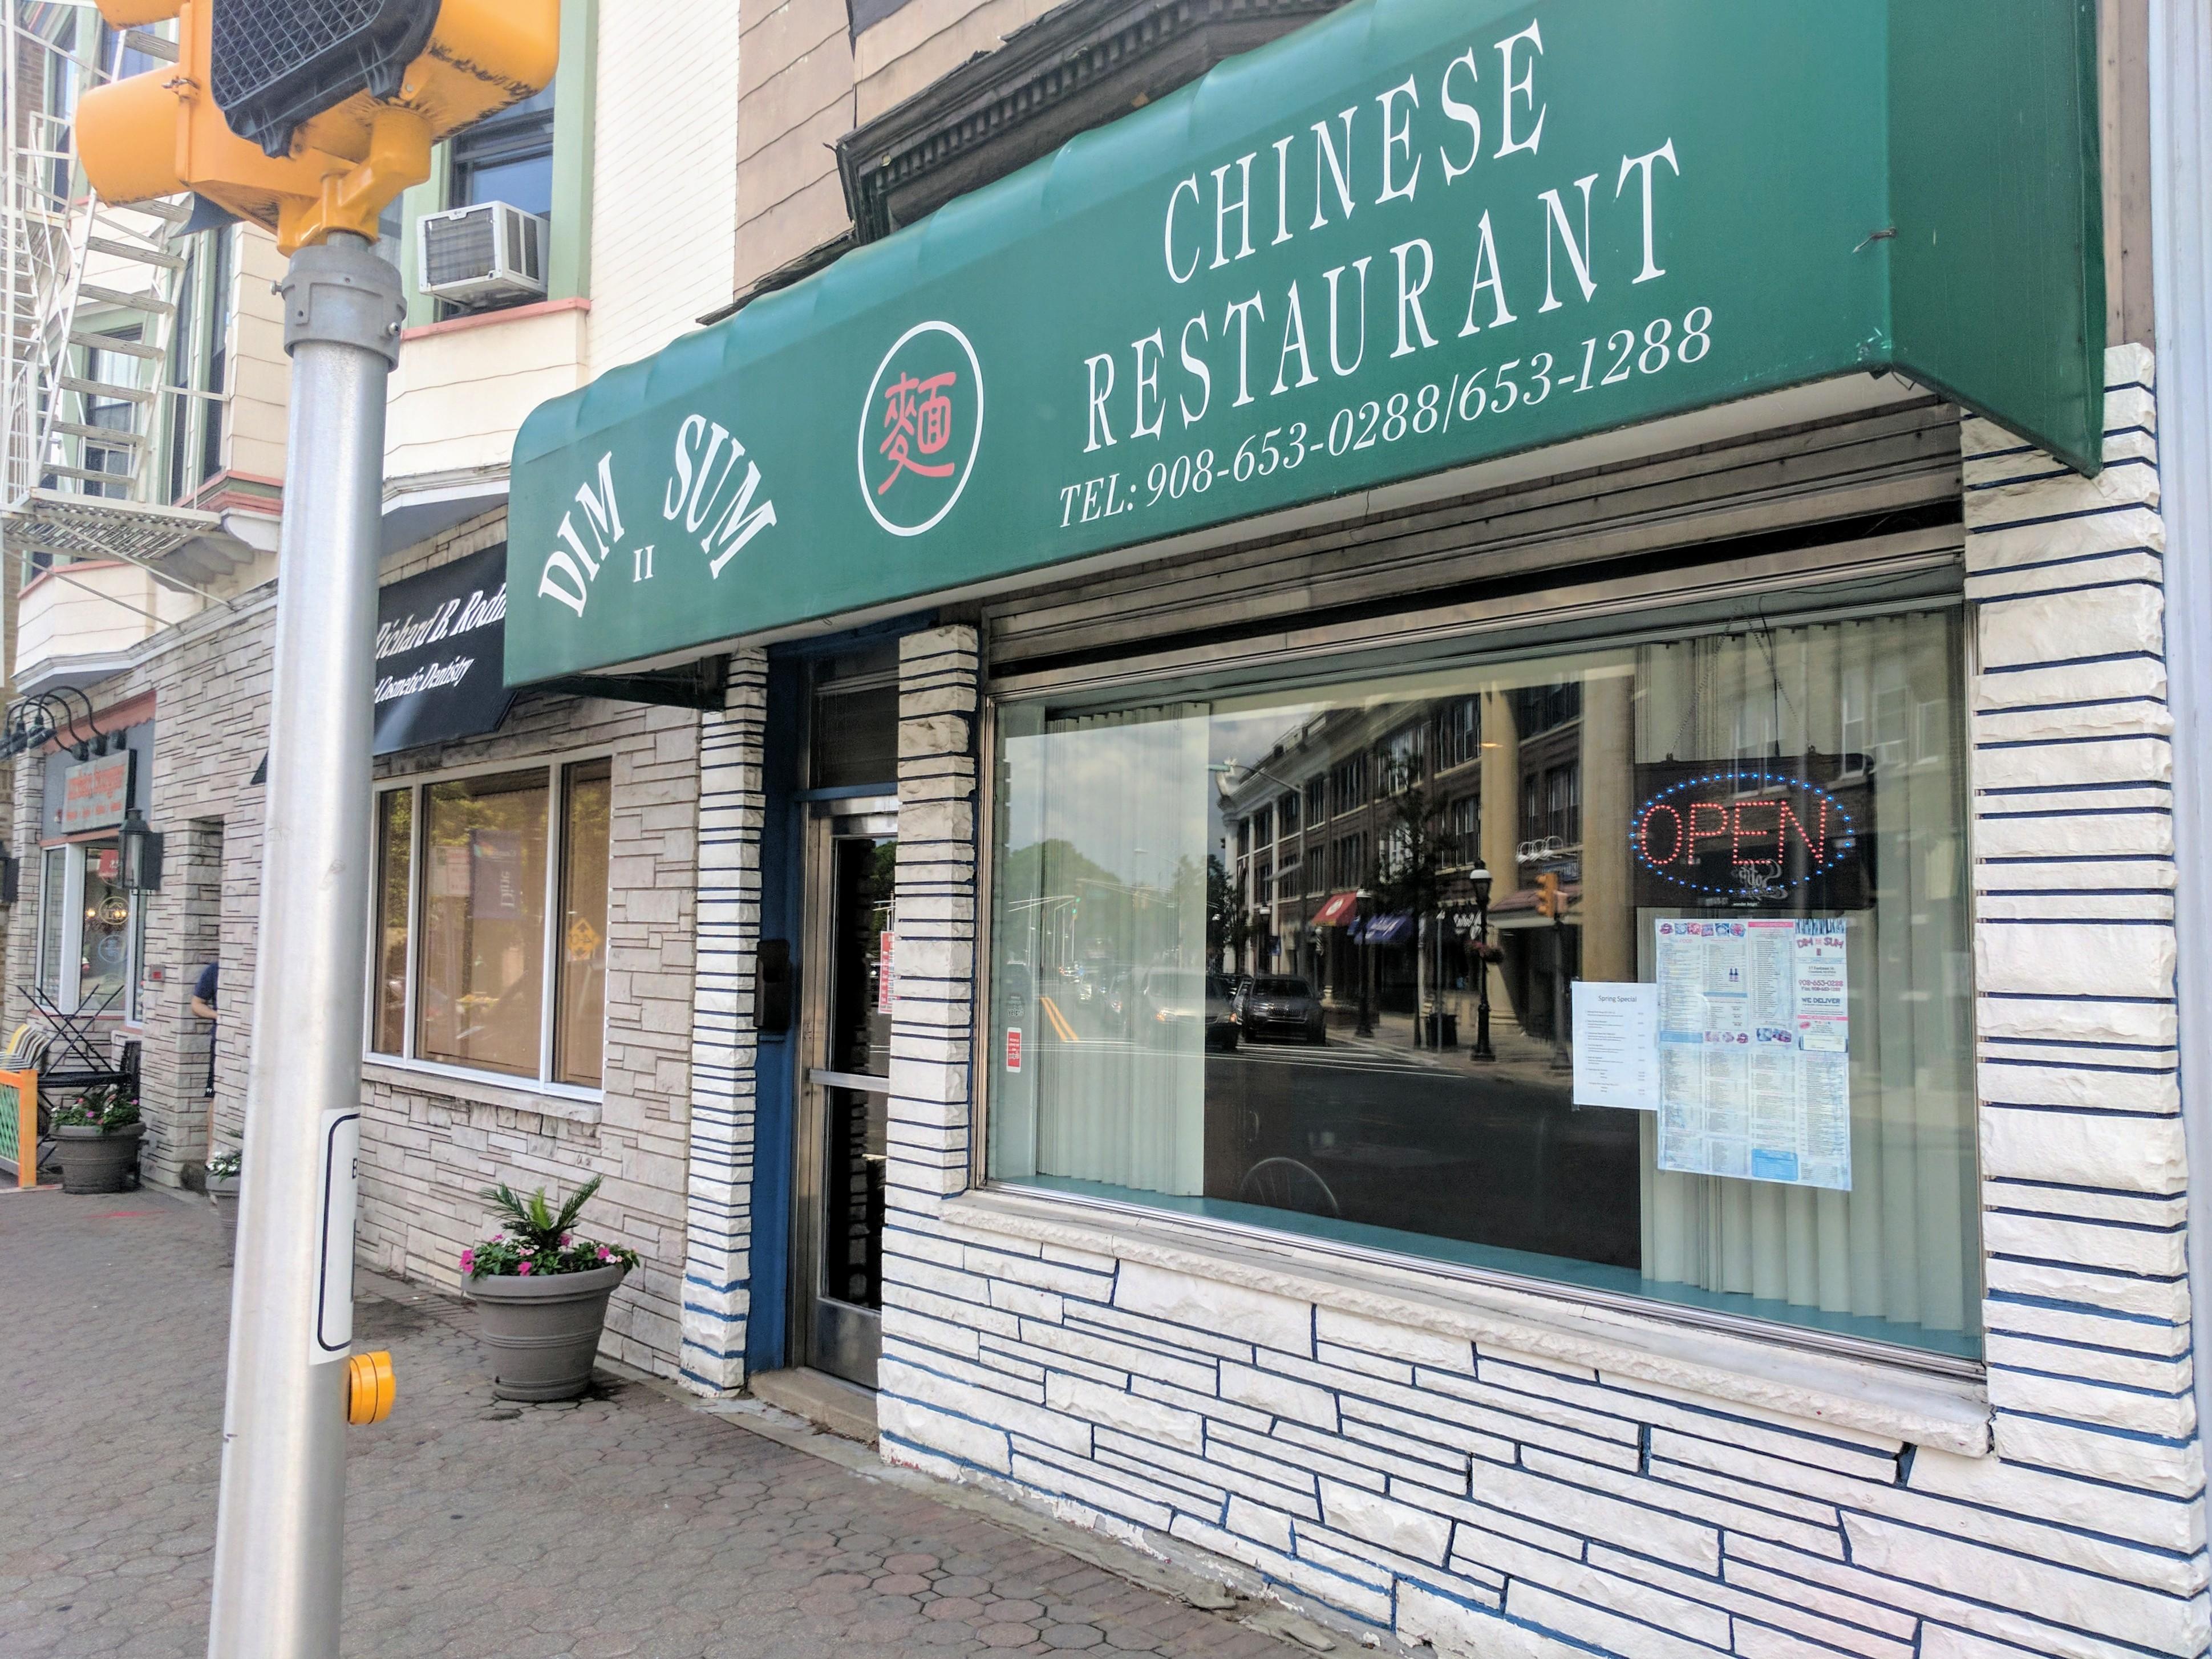 Dim Sum II Chinese Restaurant - Cranford | Restaurant Review - Zagat